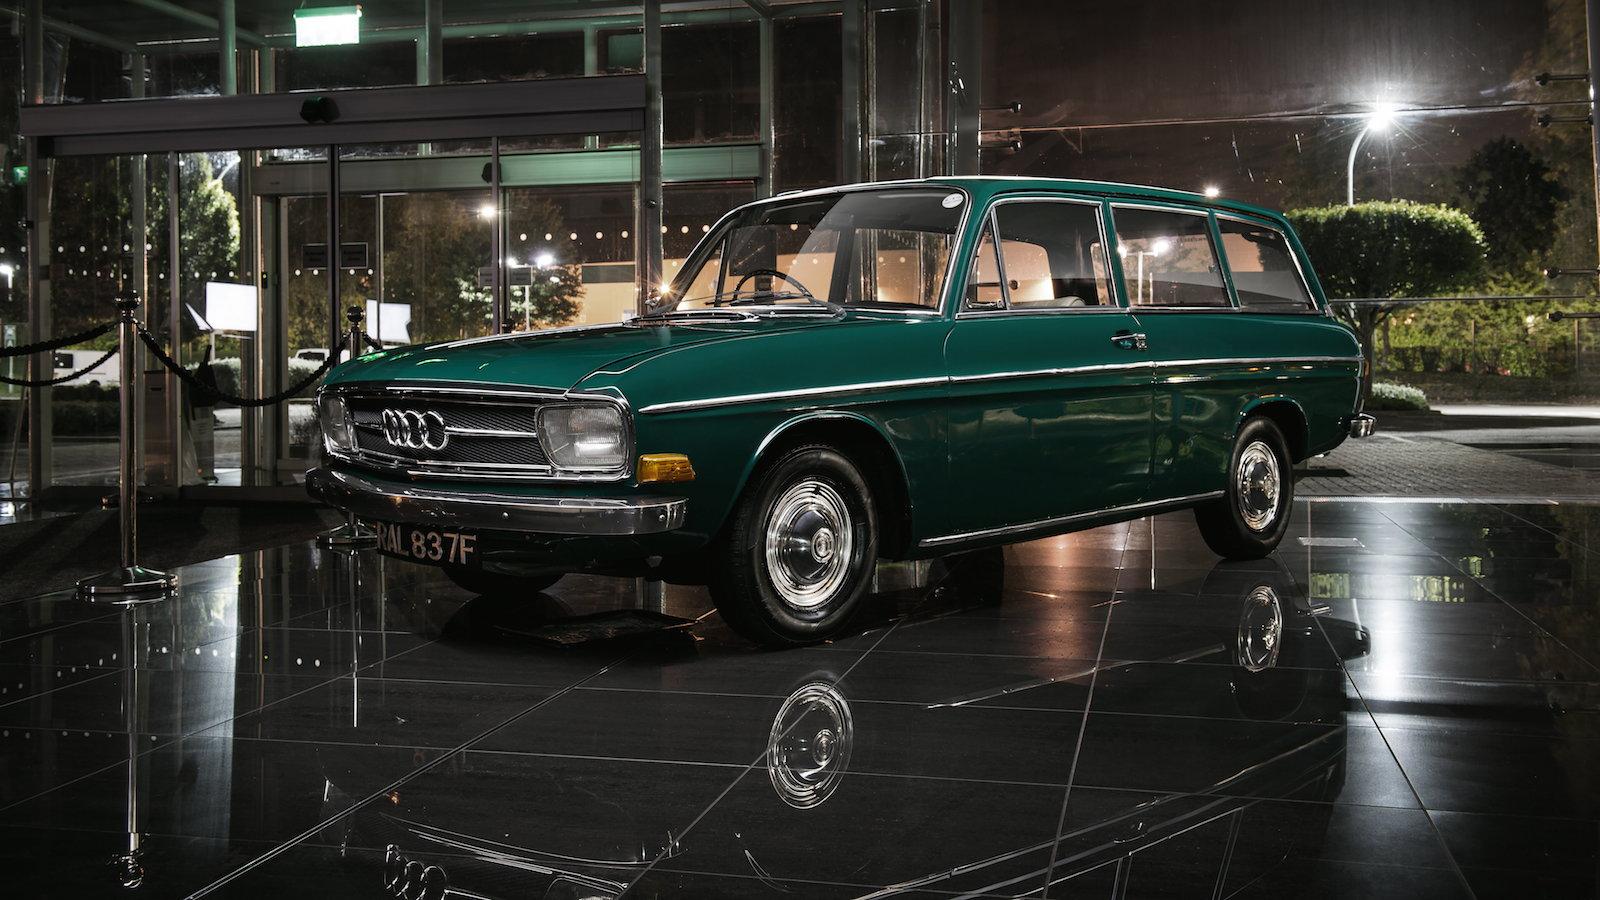 1968 Audi 80 Variant